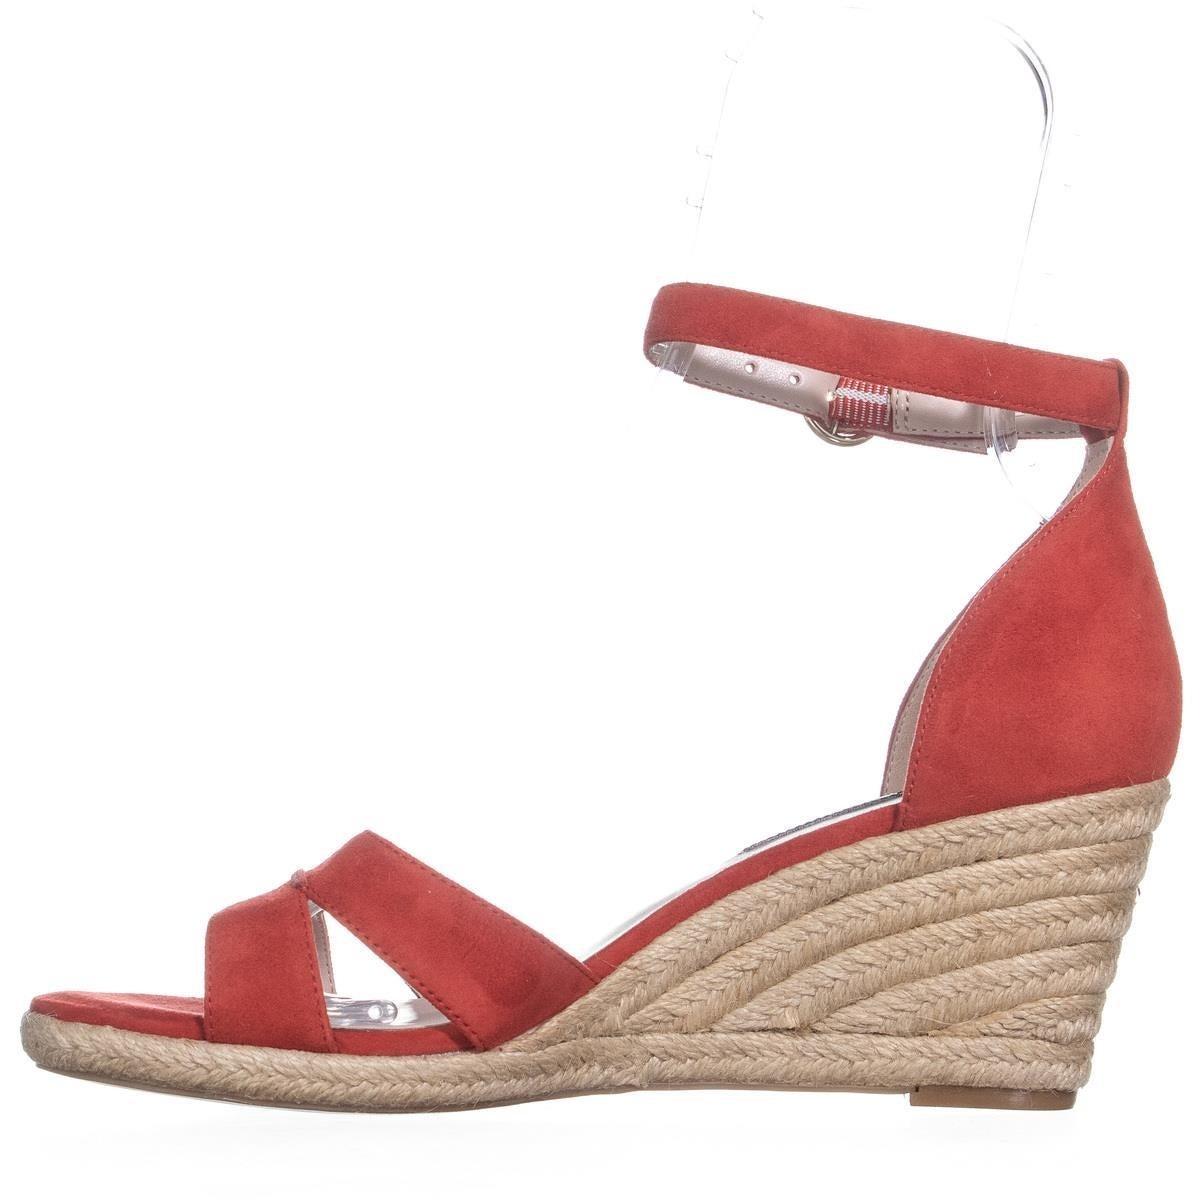 27ea386ce4 Shop Nine West Jeranna Wedge Heel Espadrilles Sandals, Red - On Sale - Free  Shipping Today - Overstock.com - 22853425